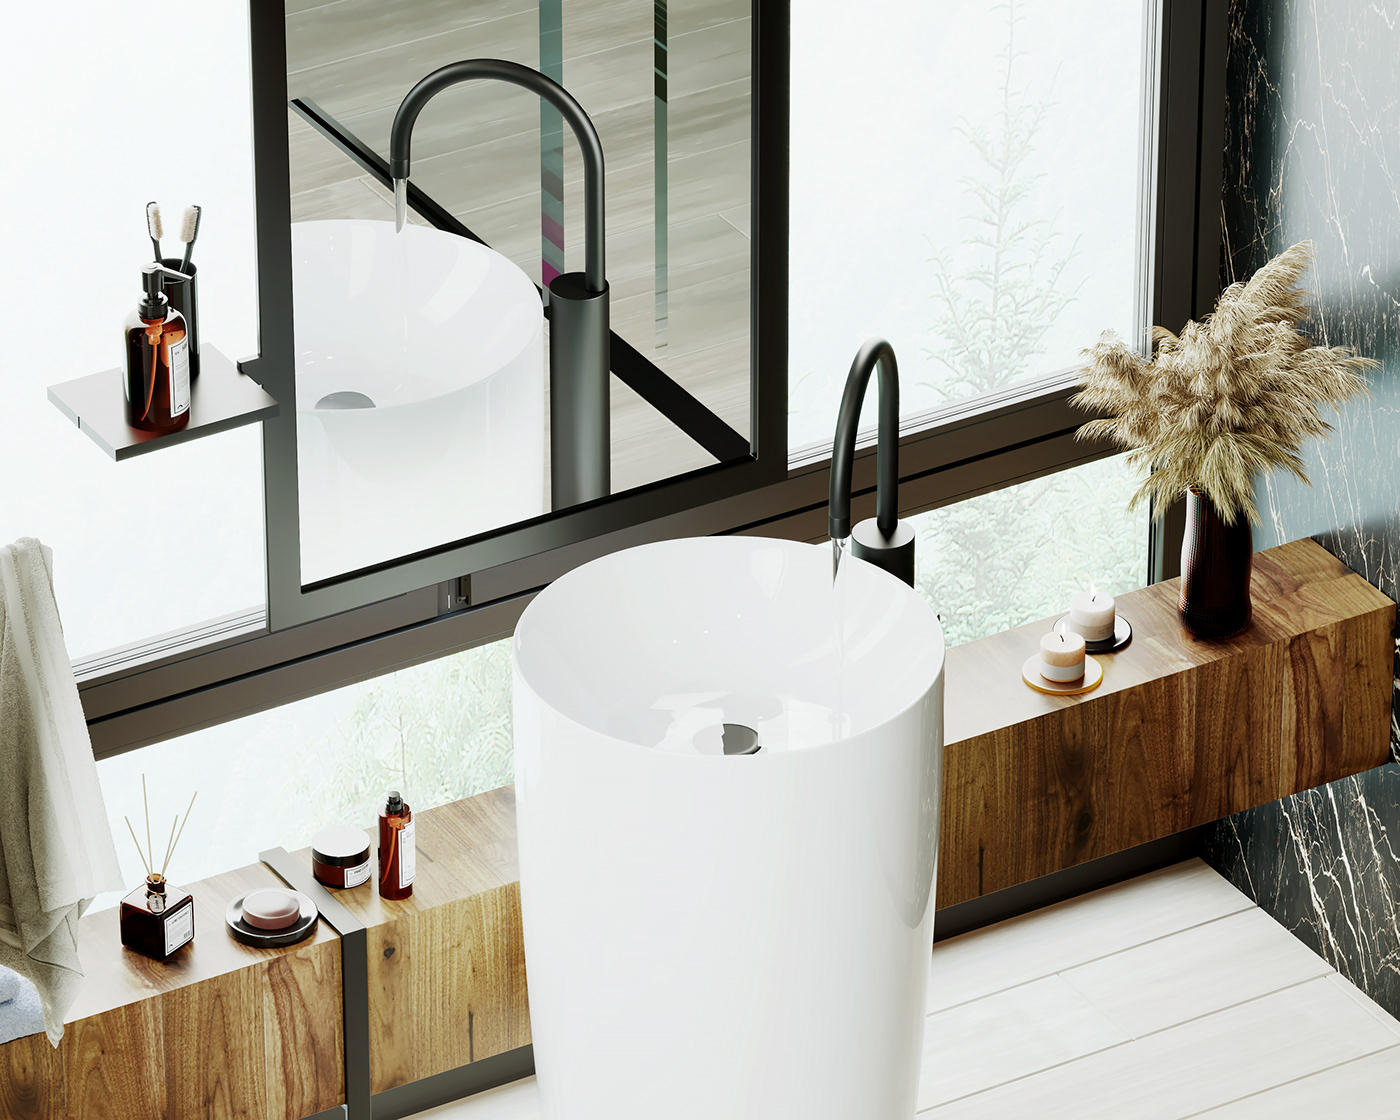 Adobe Photoshop architecture arquitectura baño bathroom cinema 4d corona render  design diseño Interiorismo